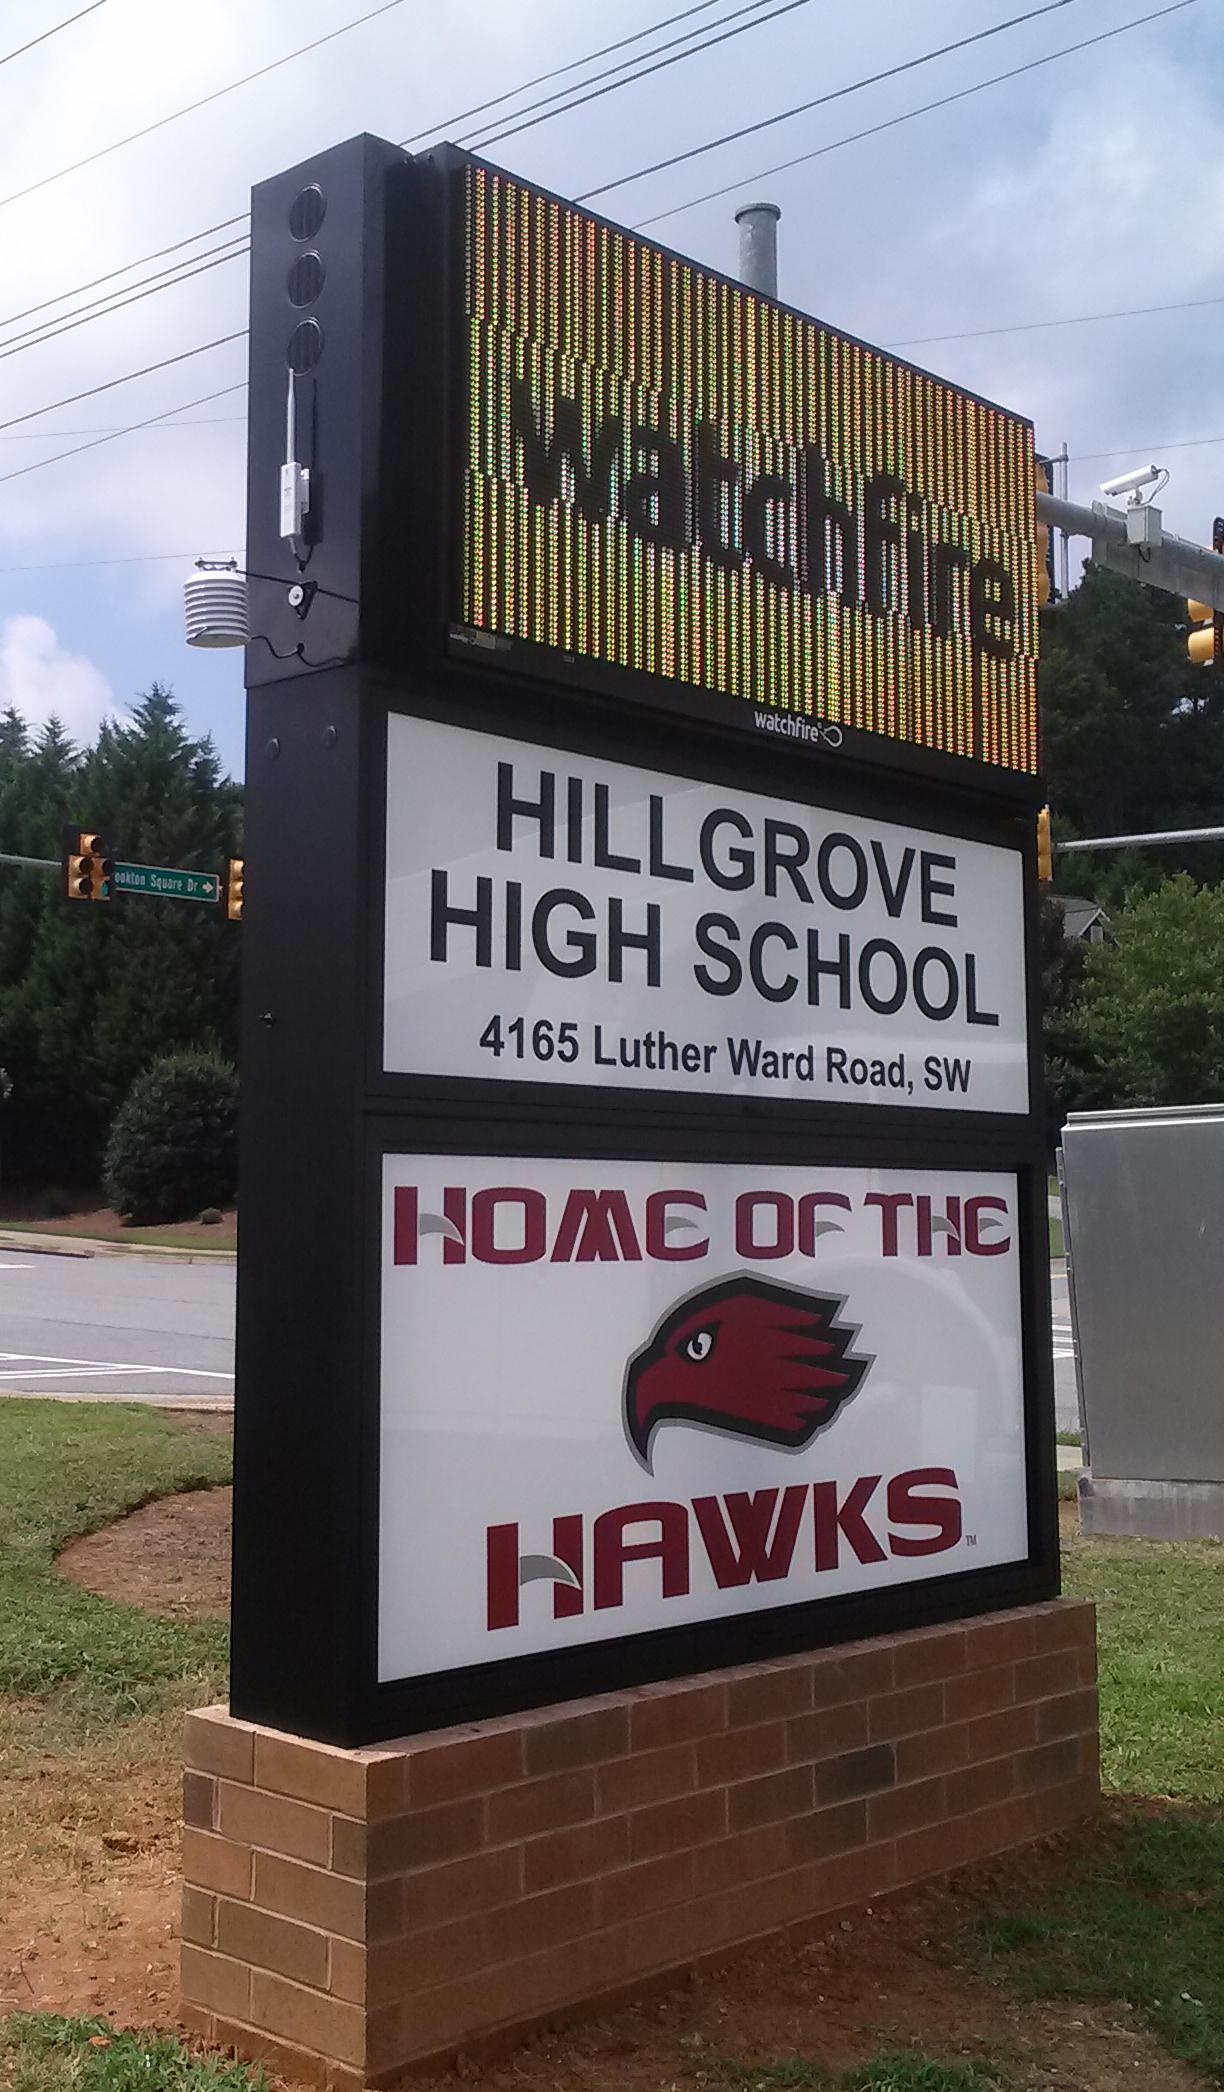 Hillgrove high school